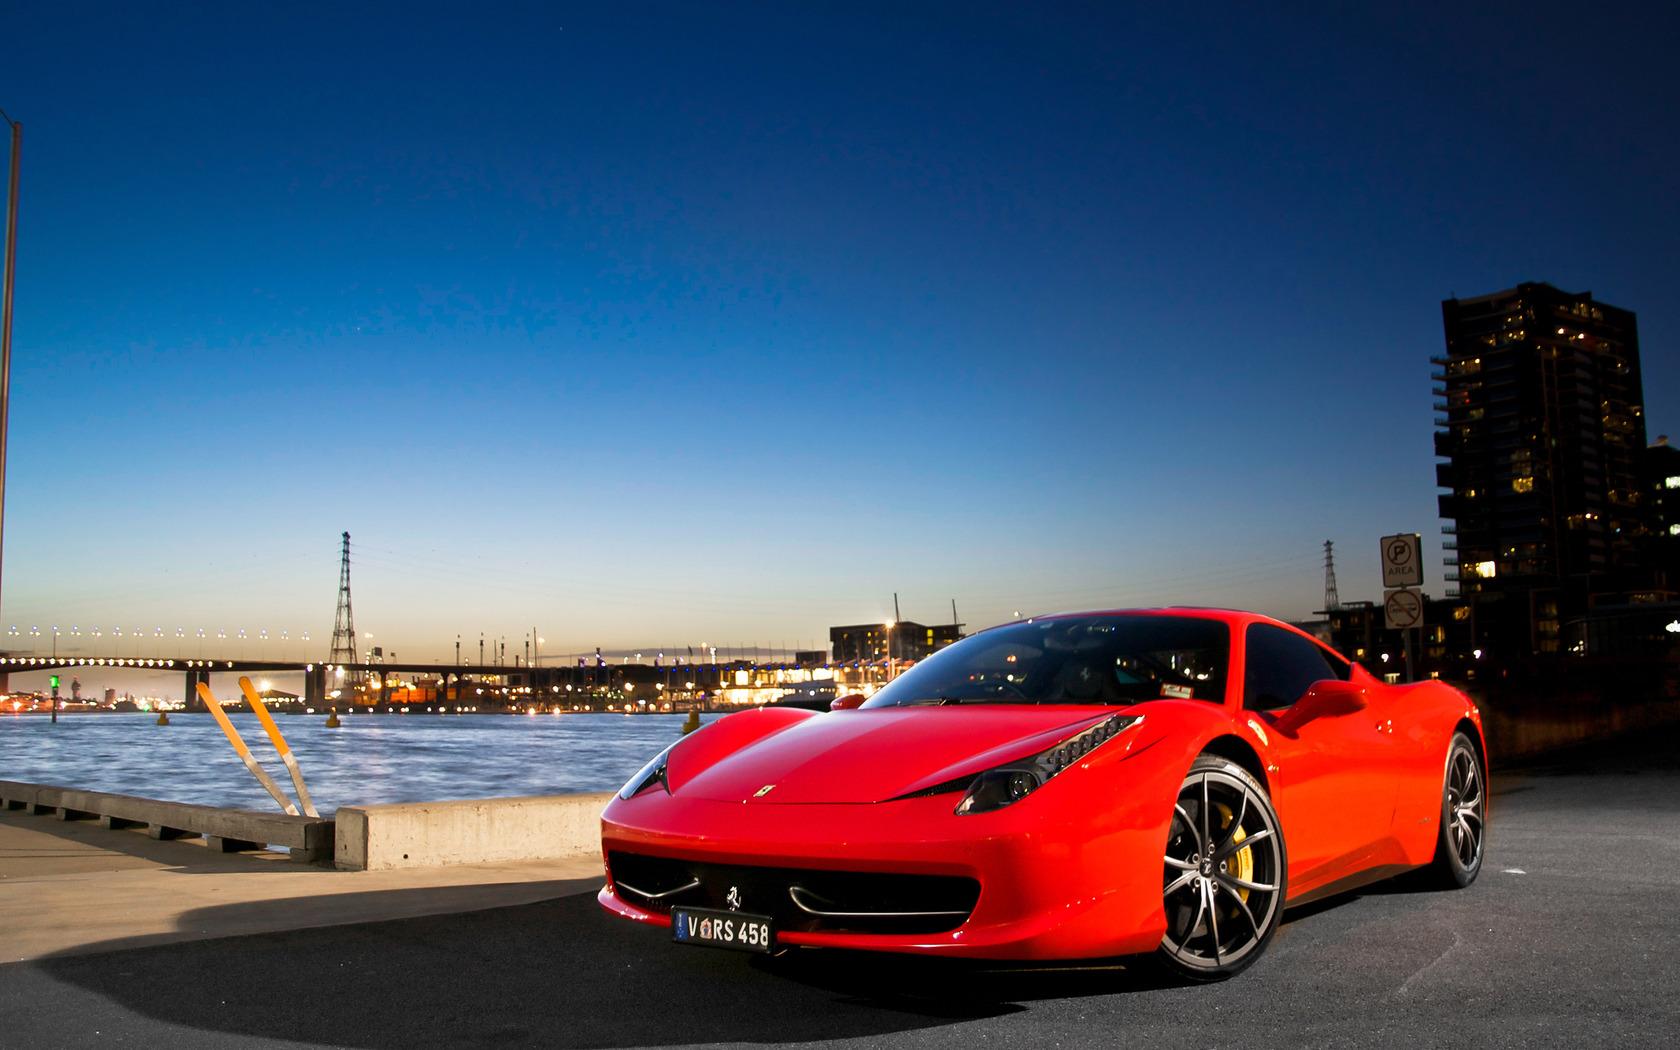 Ferrari 458 Italia wallpaper 33426 1680x1050